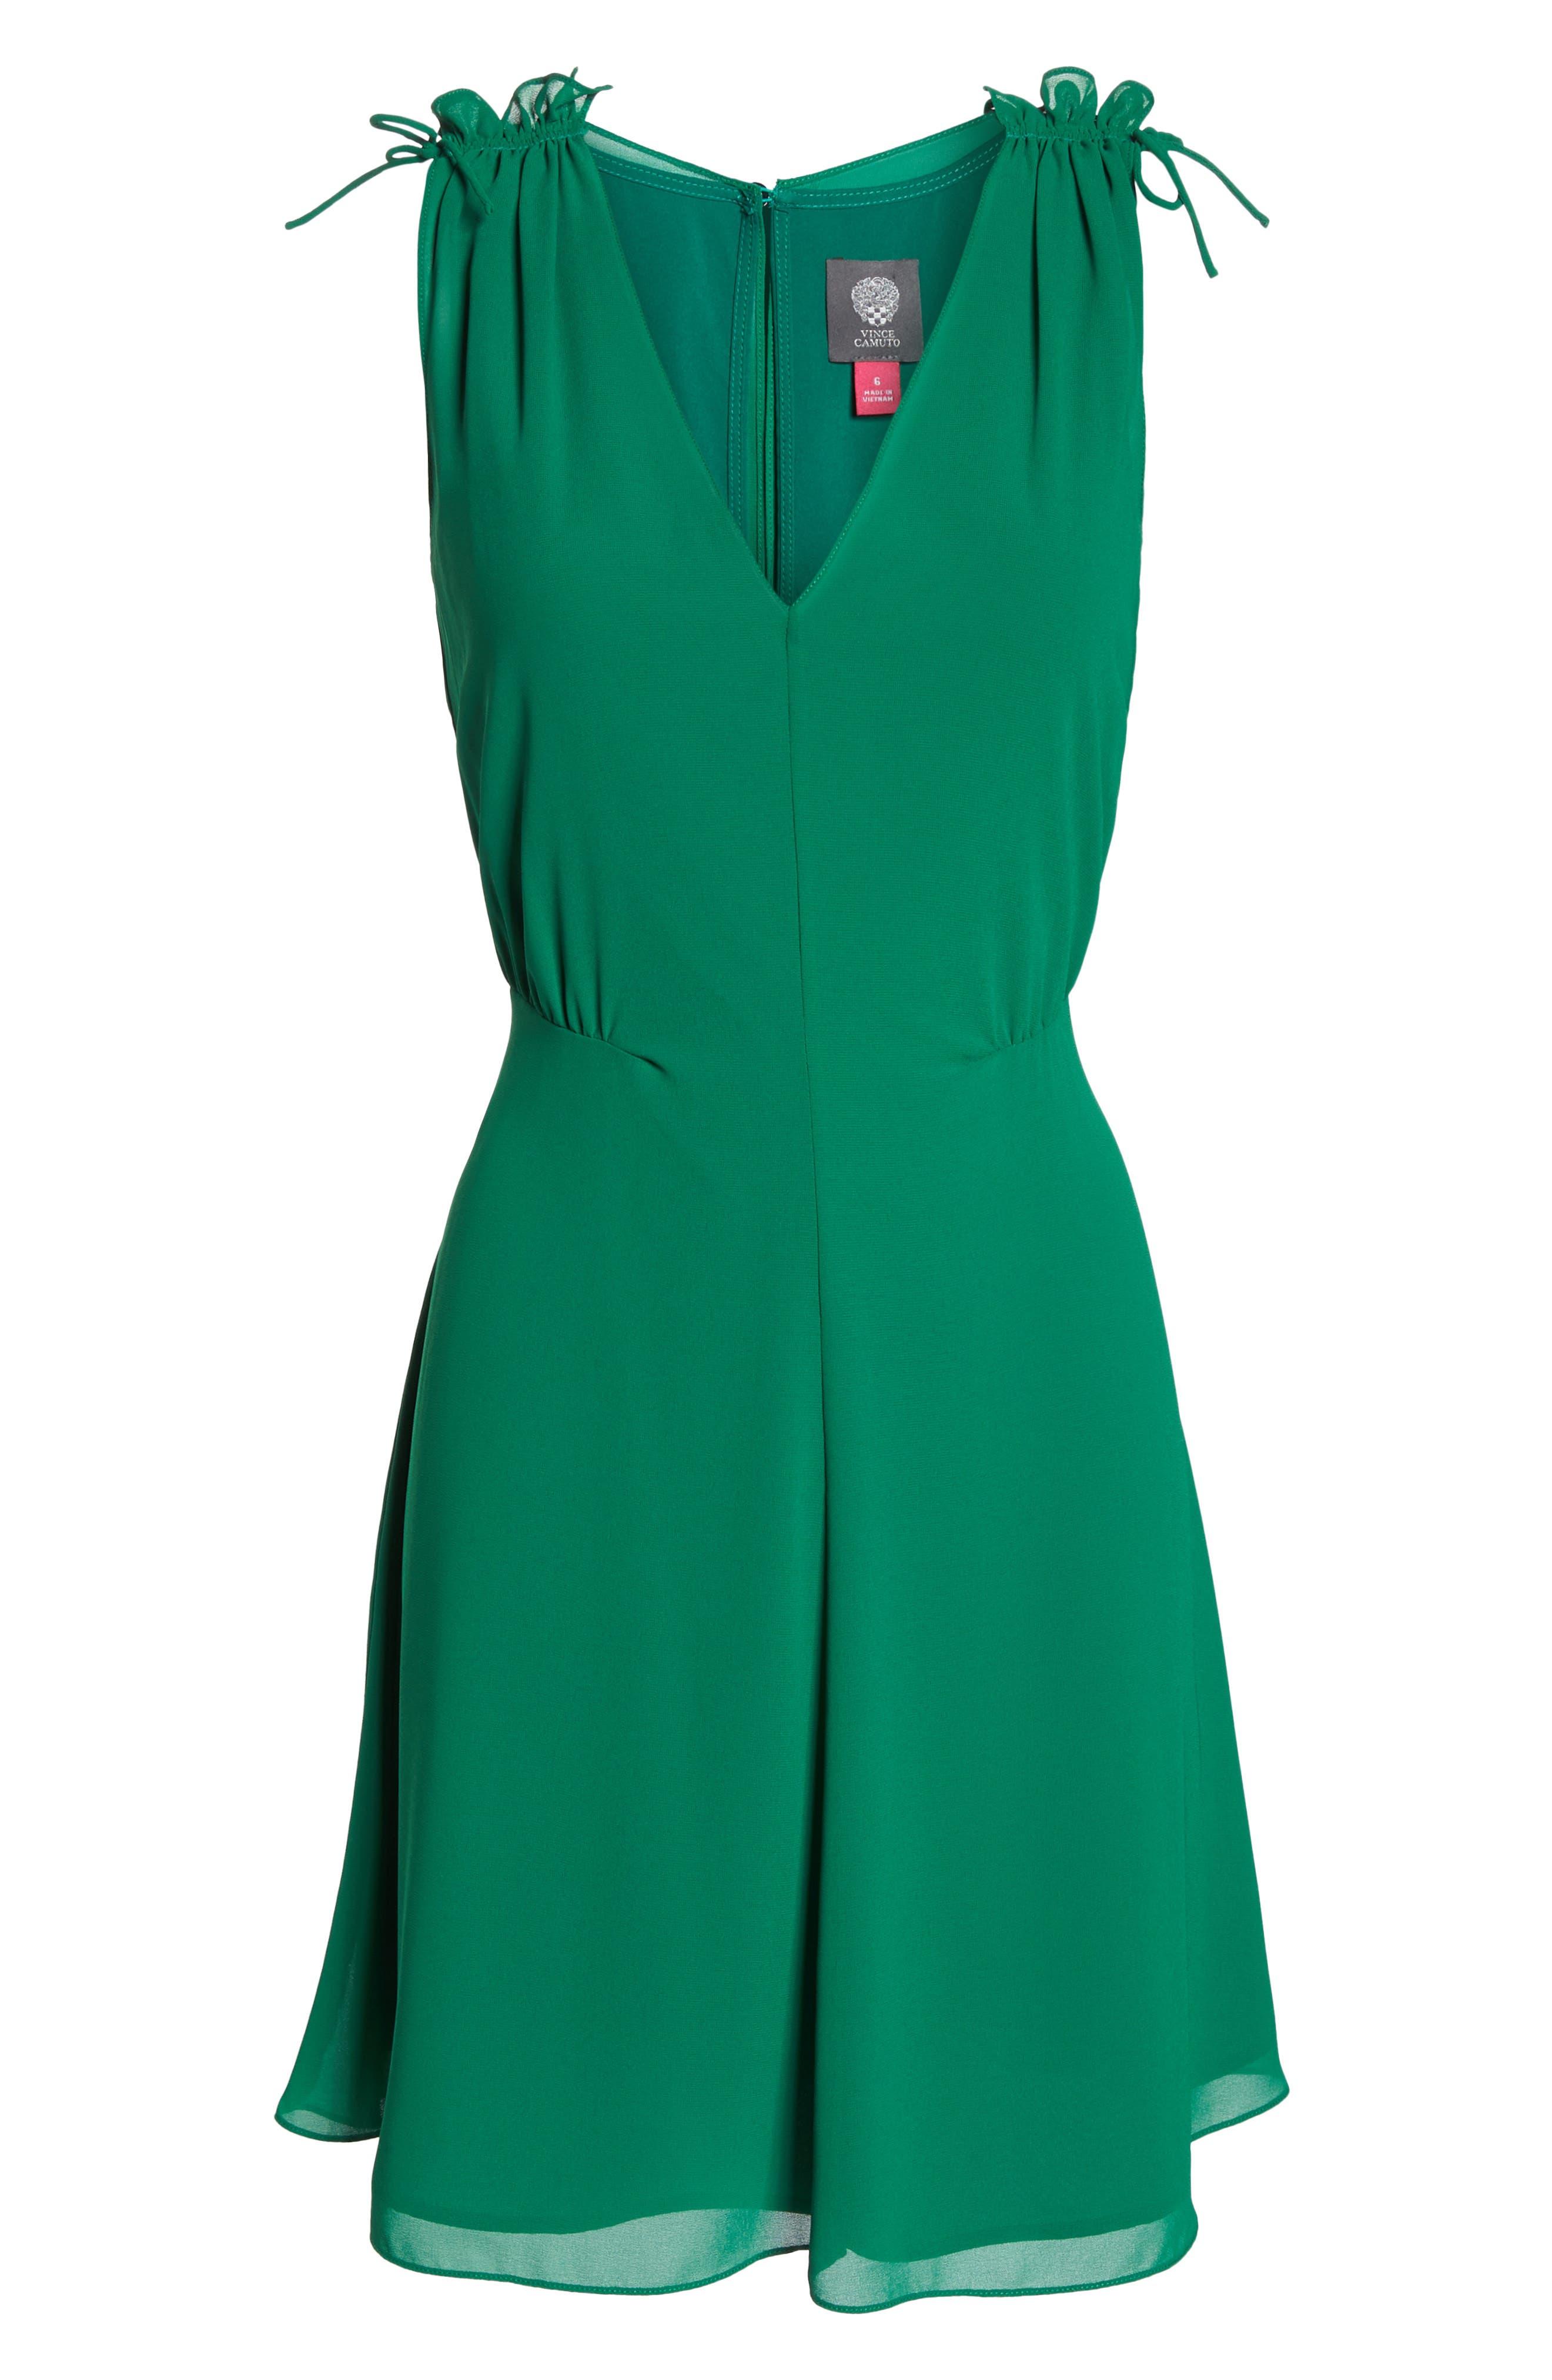 Soufflé V-Neck Chiffon Dress,                             Alternate thumbnail 7, color,                             310